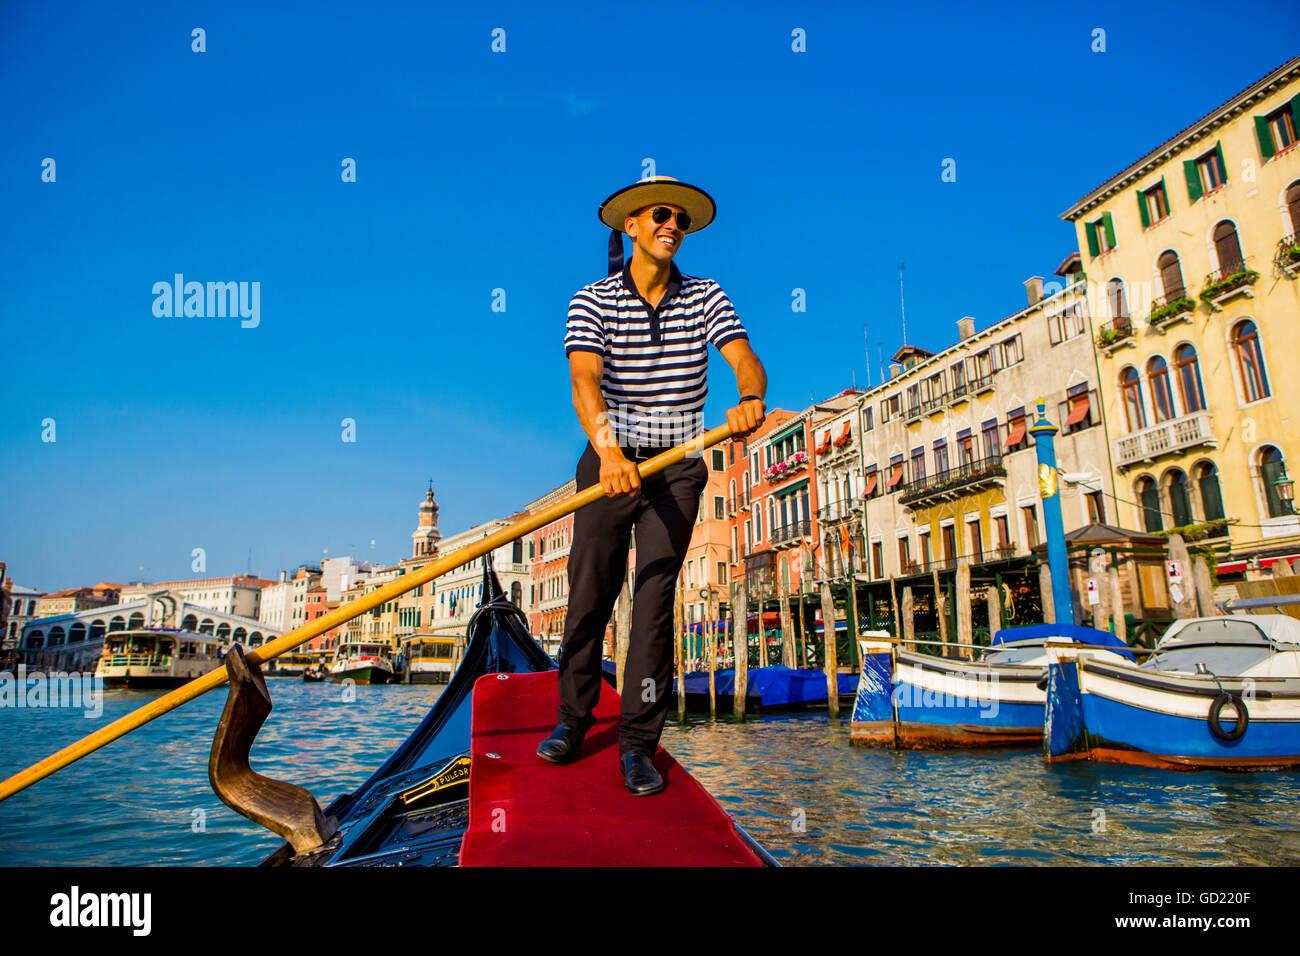 Gondolier in Venice, UNESCO World Heritage Site, Veneto, Italy, Europe - Stock Image